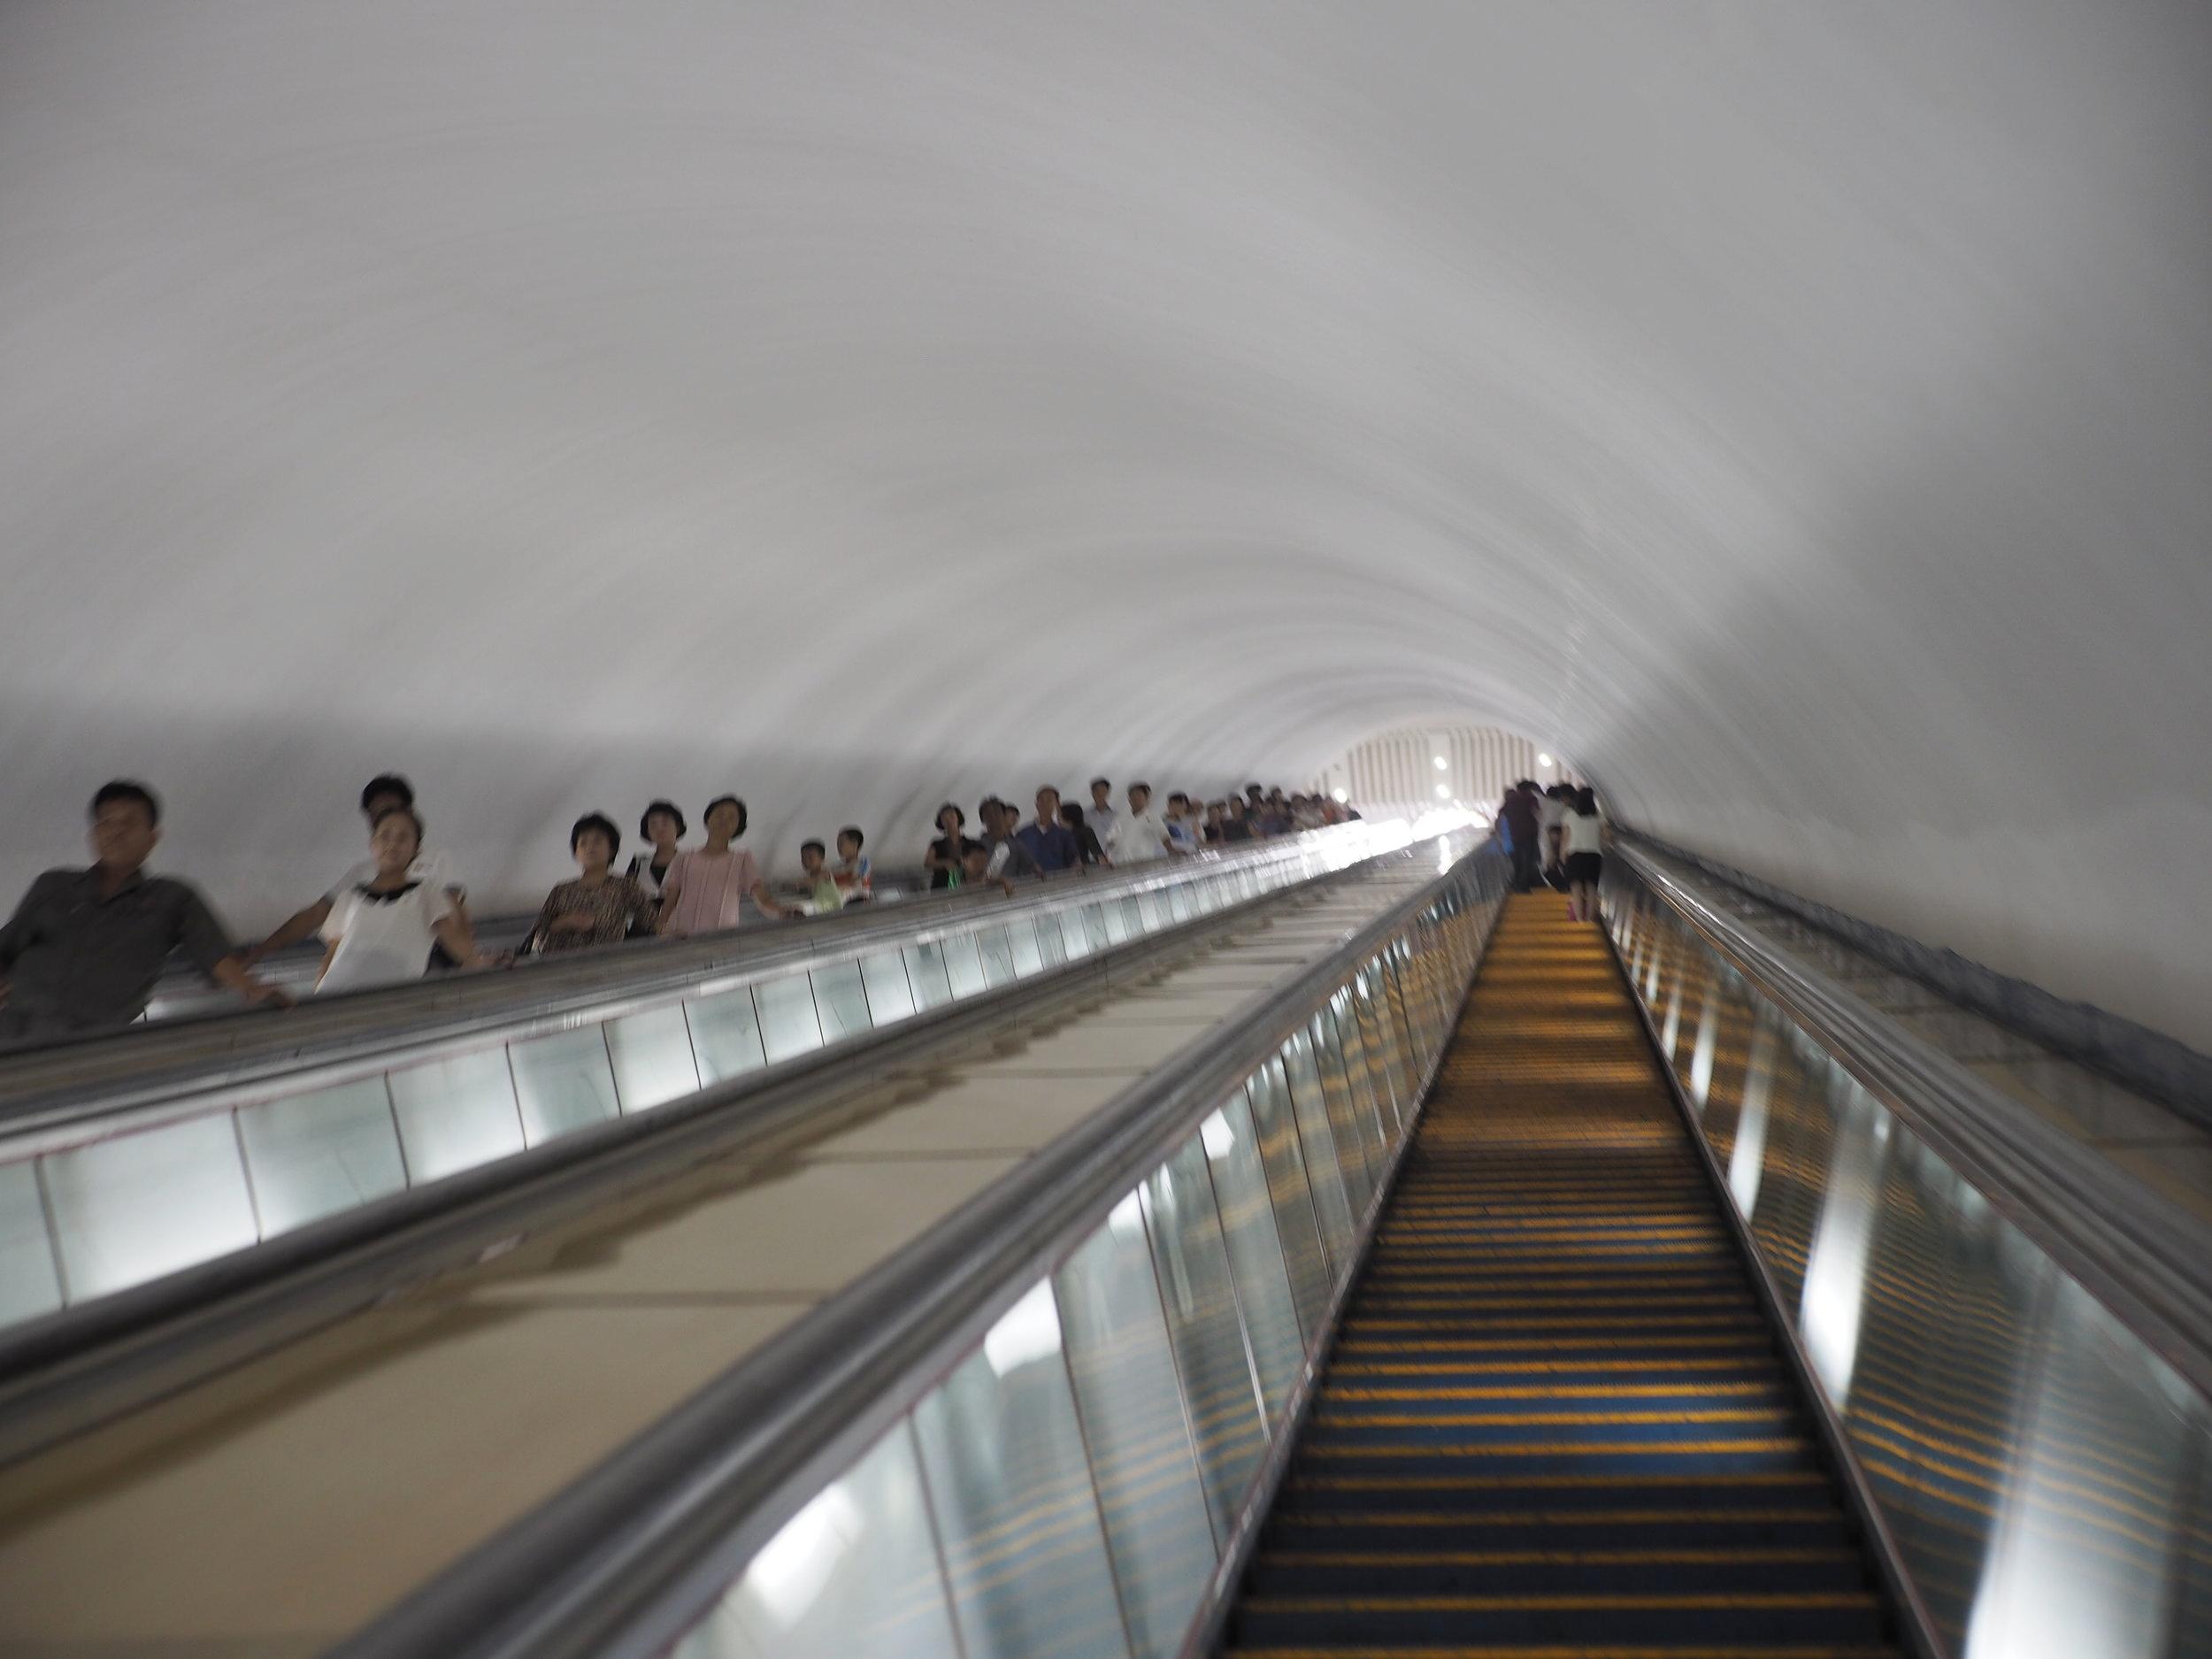 Escalators to the entrance